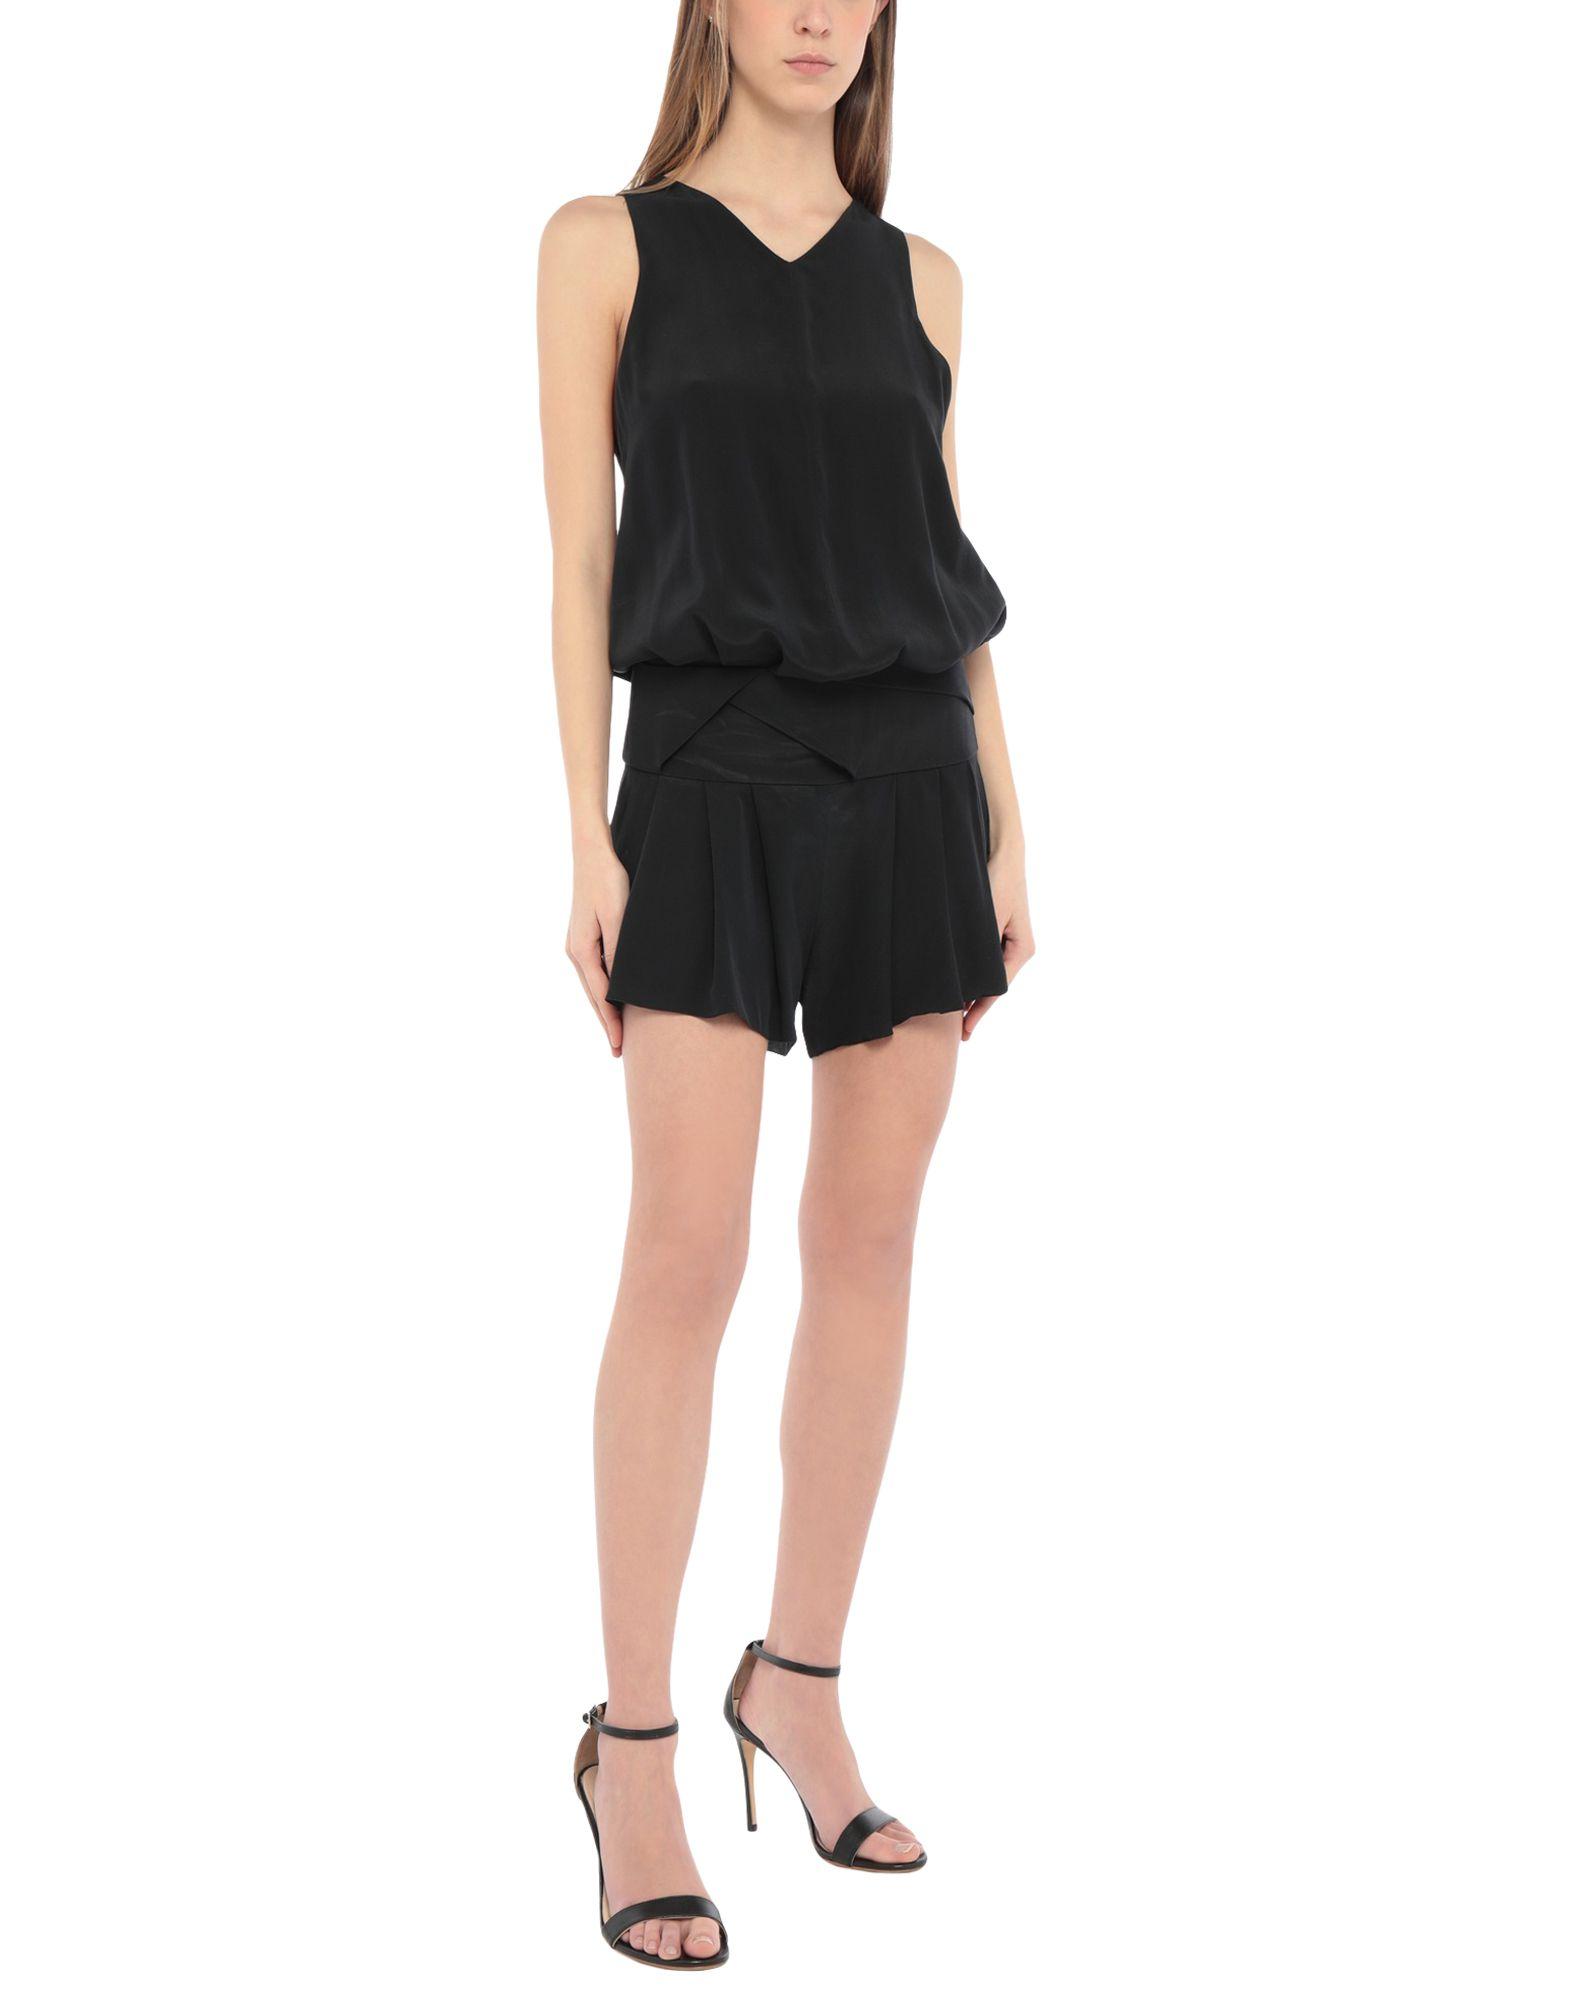 NEIL BARRETT Jumpsuits. crêpe, v-neckline, sleeveless, no appliqués, no pockets, zip closure, side closure, solid color. 100% Silk